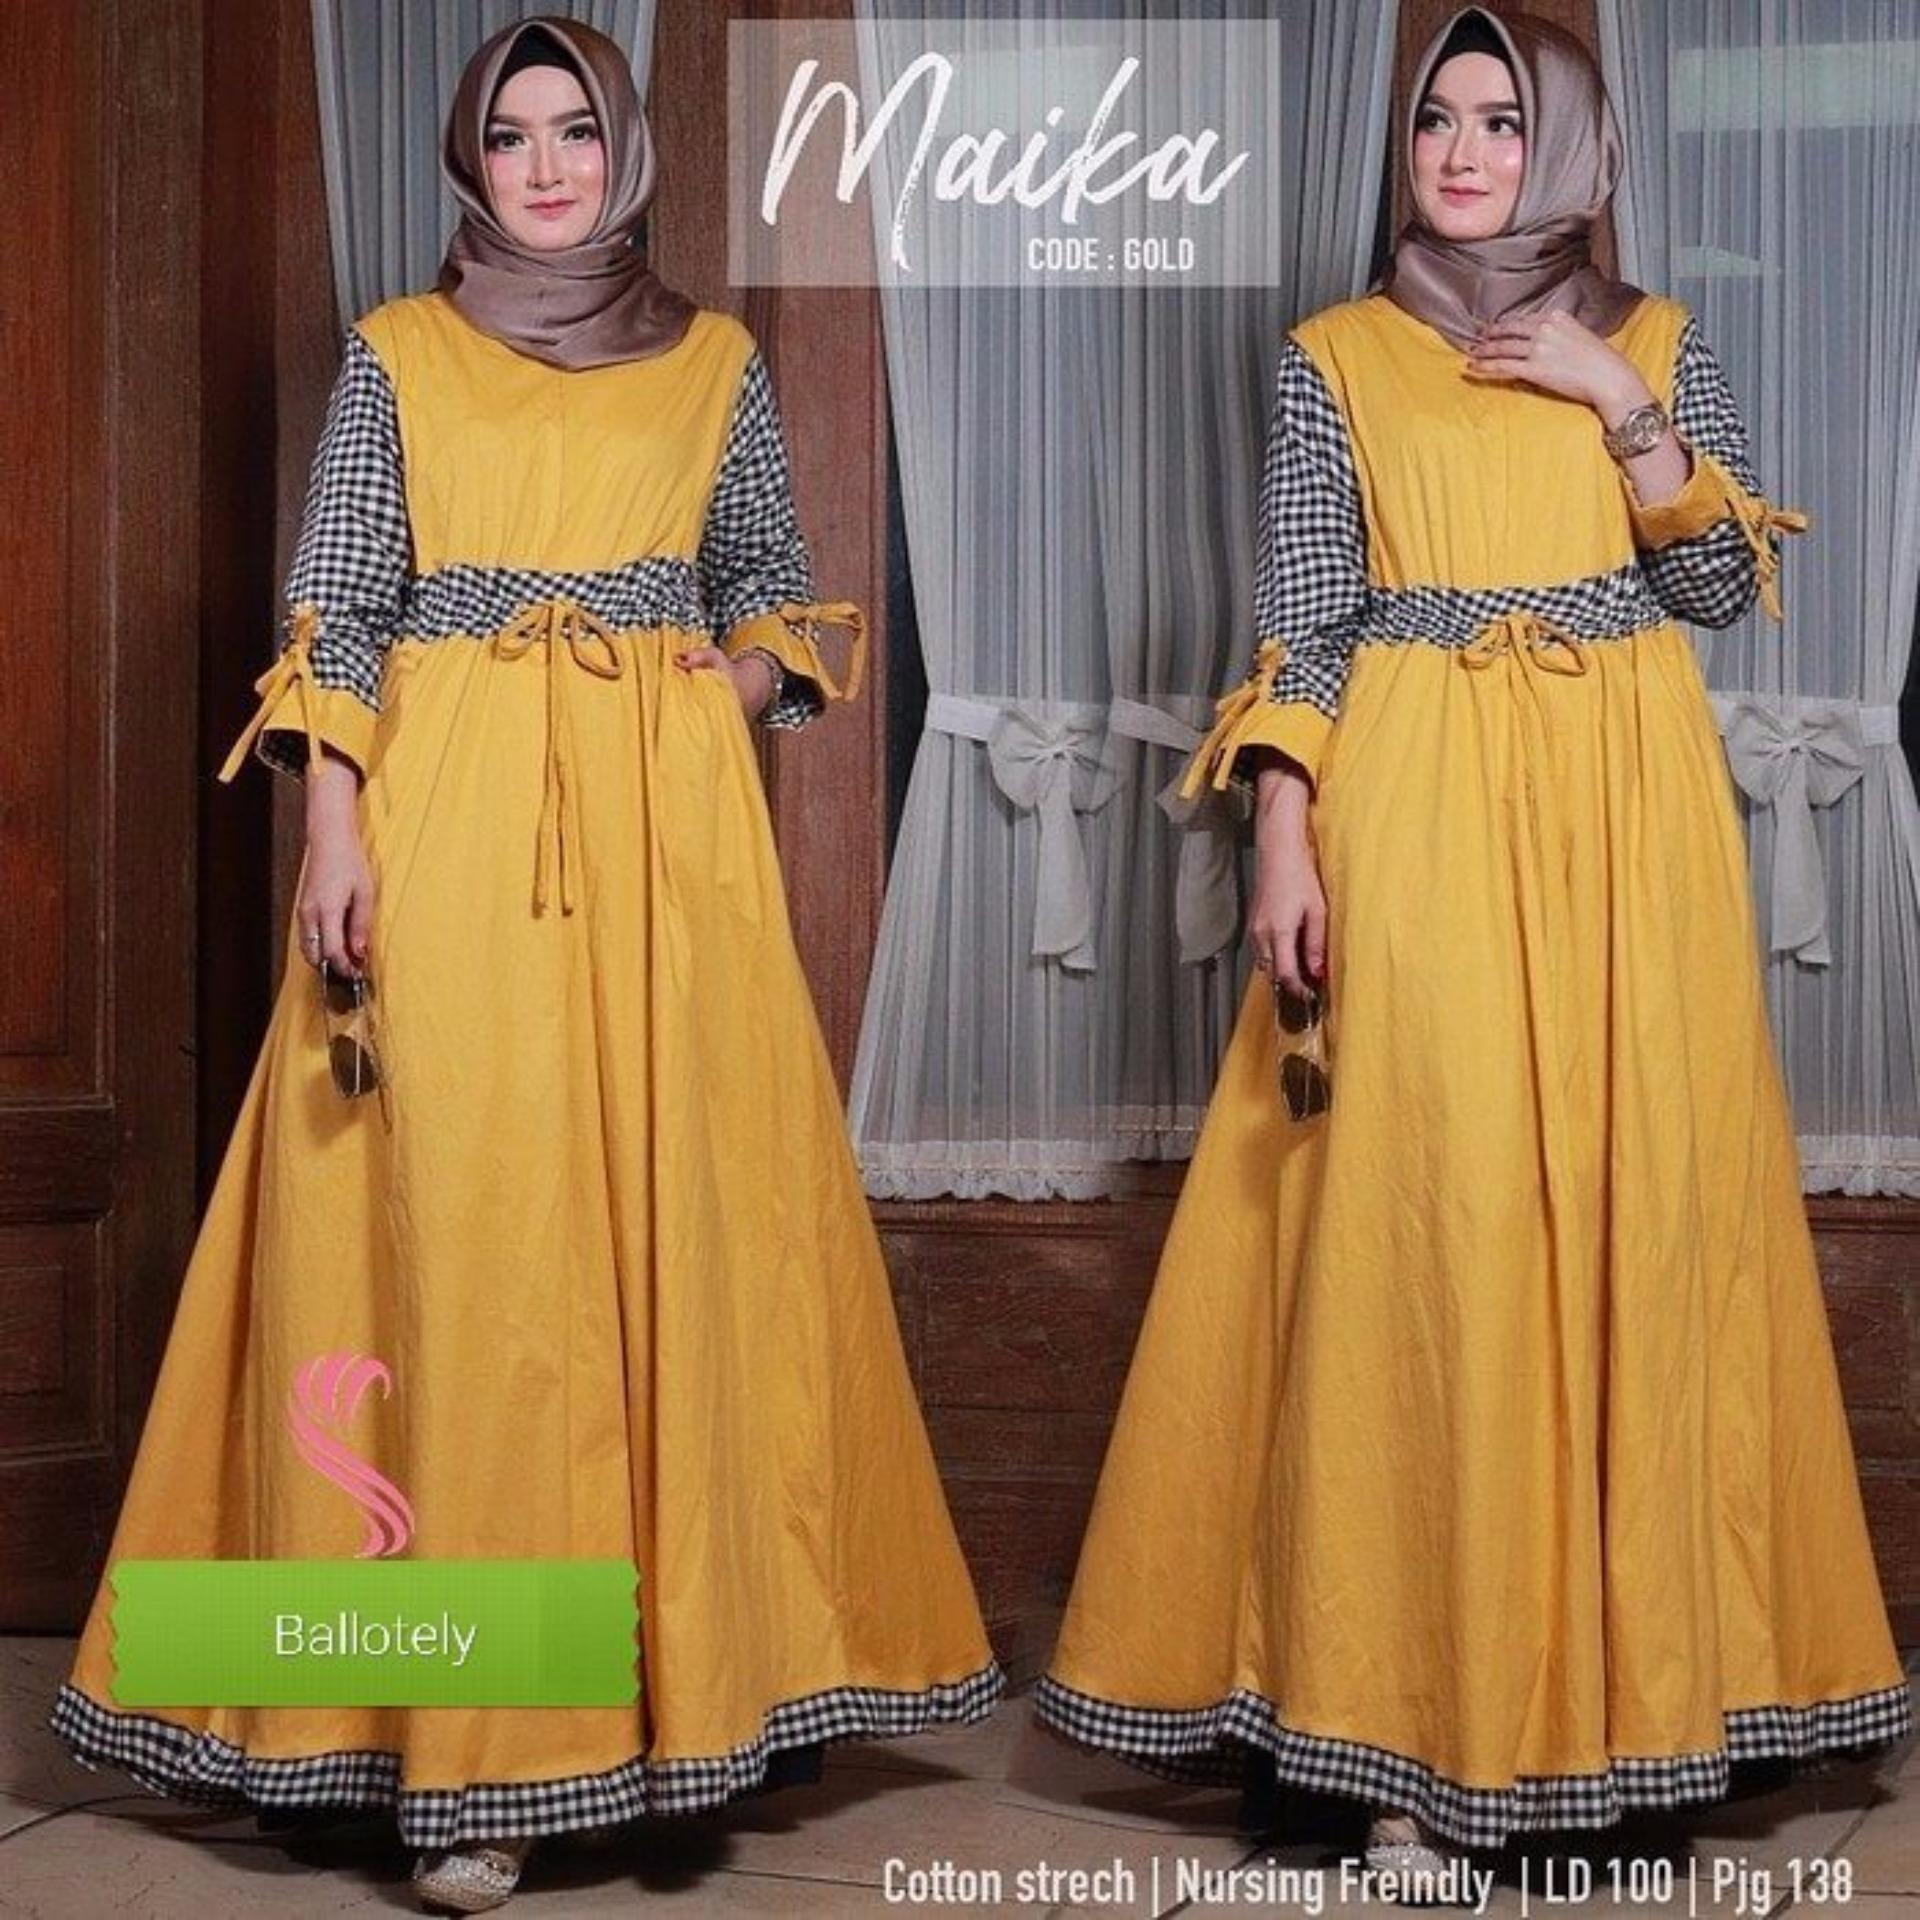 Gallery Produk Baju Original Gamis Maika Dress Panjang Muslim Casual Wanita Pakaian Hijab Modern Modis Trendy Warna Mustard